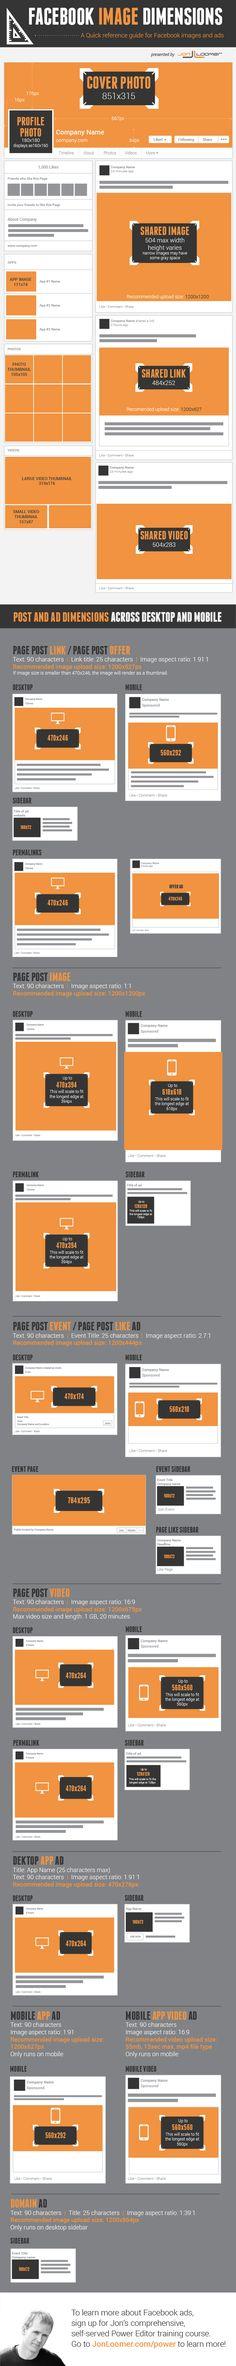 #Facebook image dimensions - A quick reference guide for facebook images and ads #Infographic.  Tutte le dimensioni delle immagini di Facebook in un #Infografica